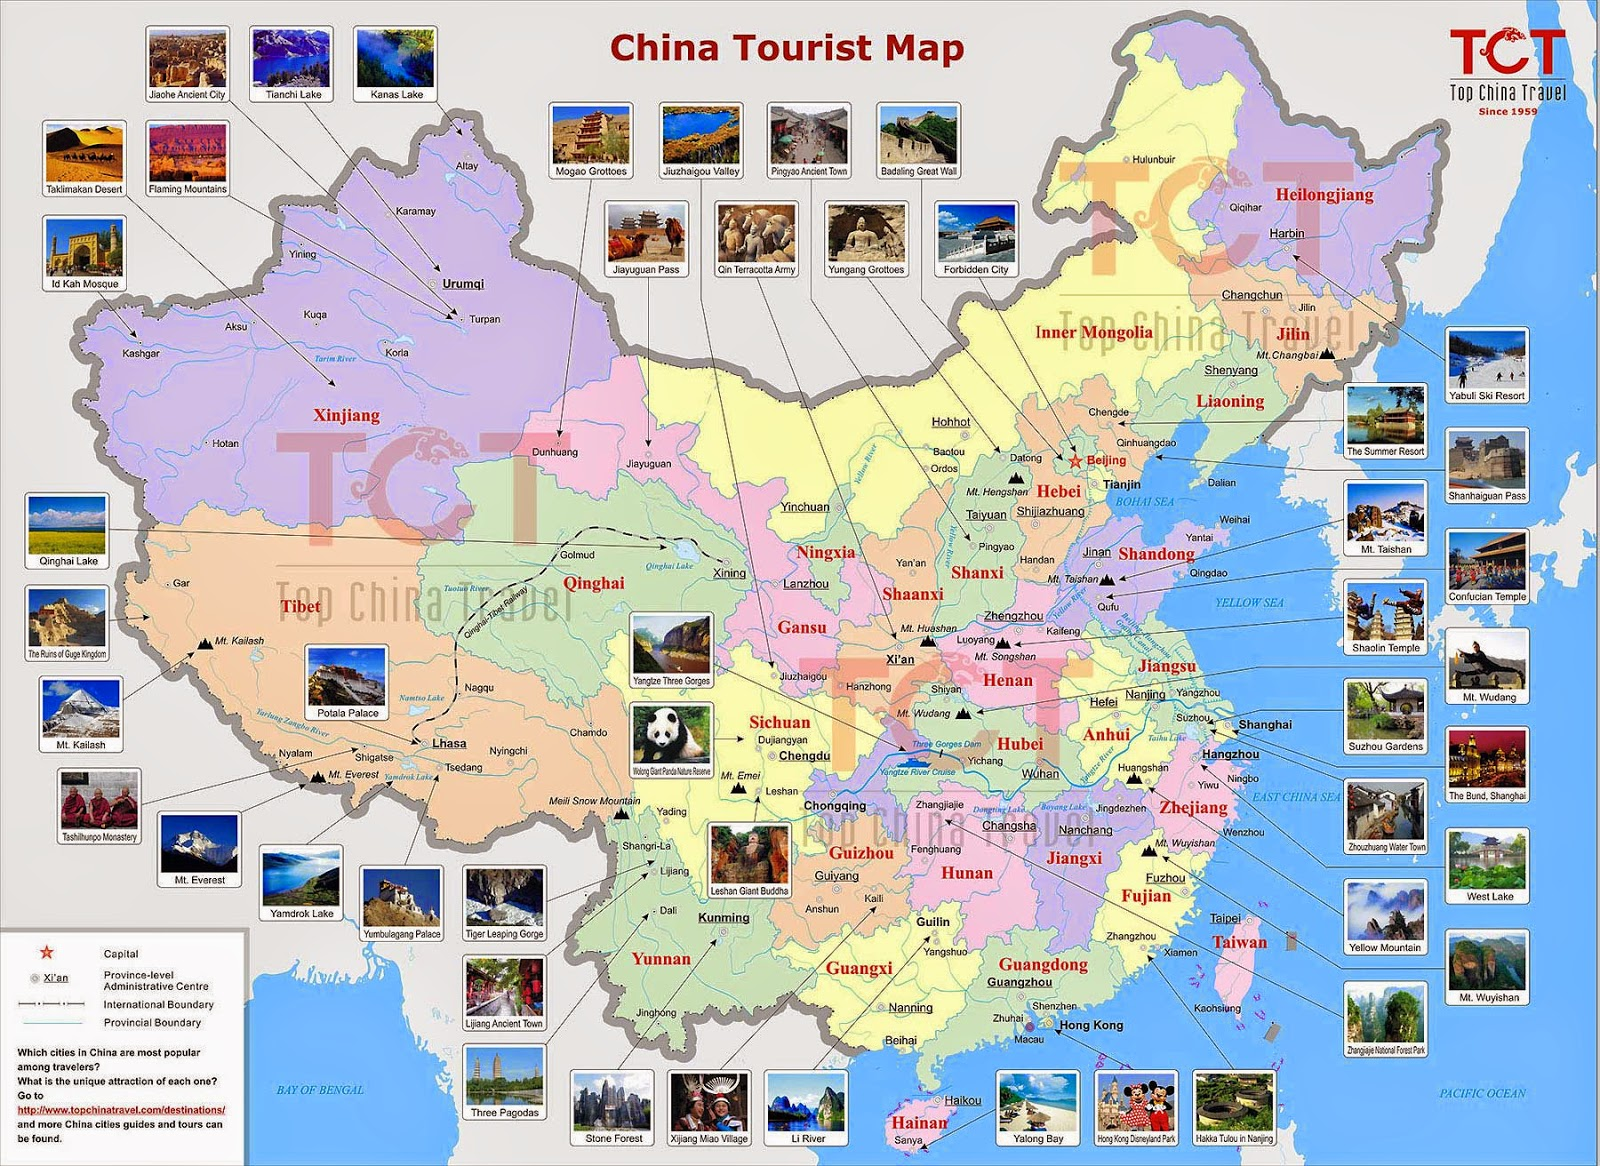 Carte touristique de chine lakestevensflorist for Carte touristique